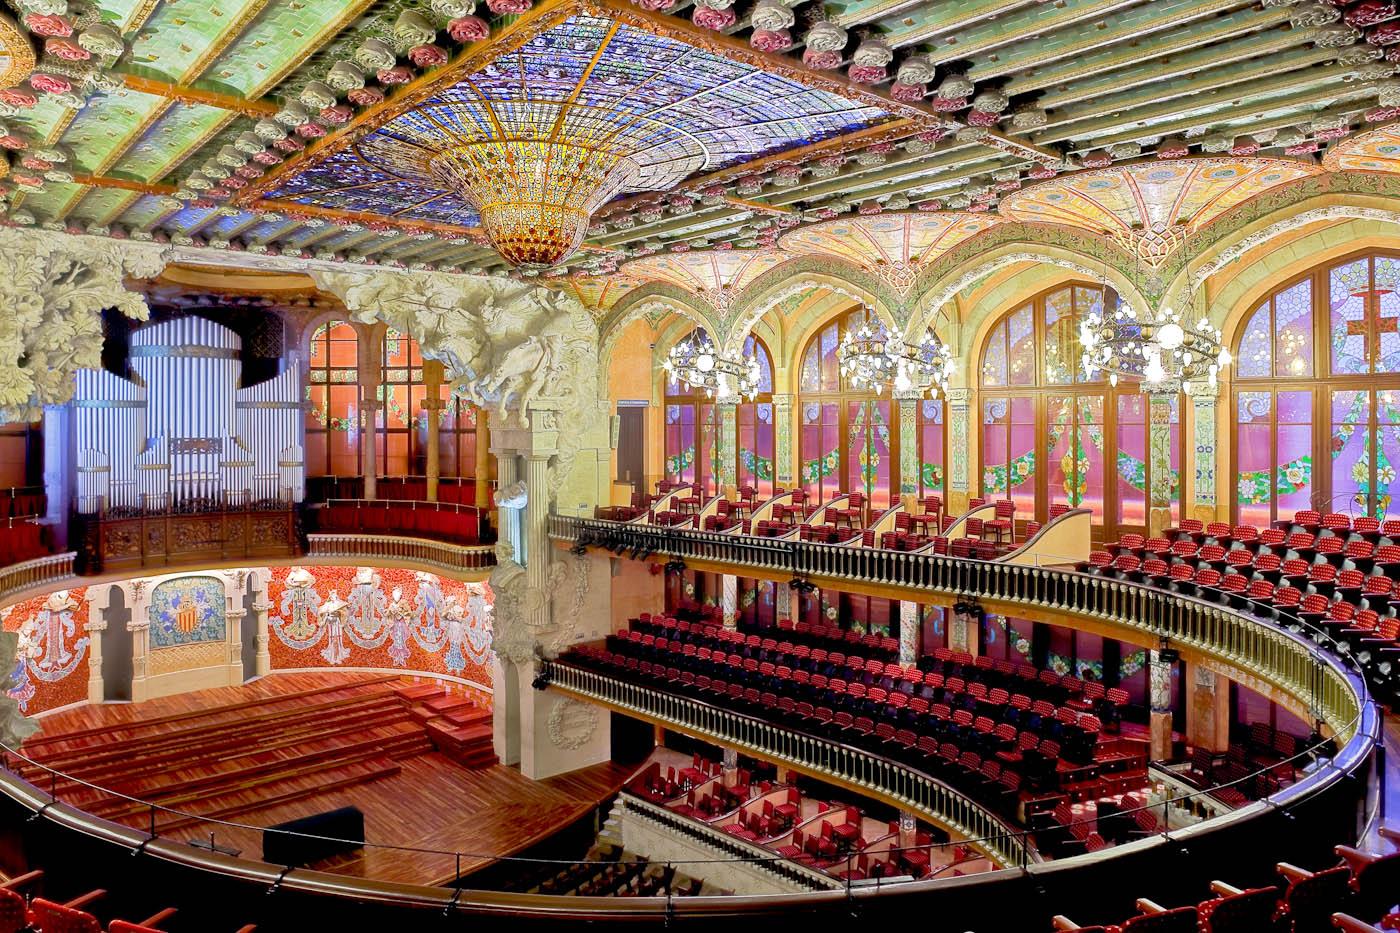 palau musica barcelona catalana